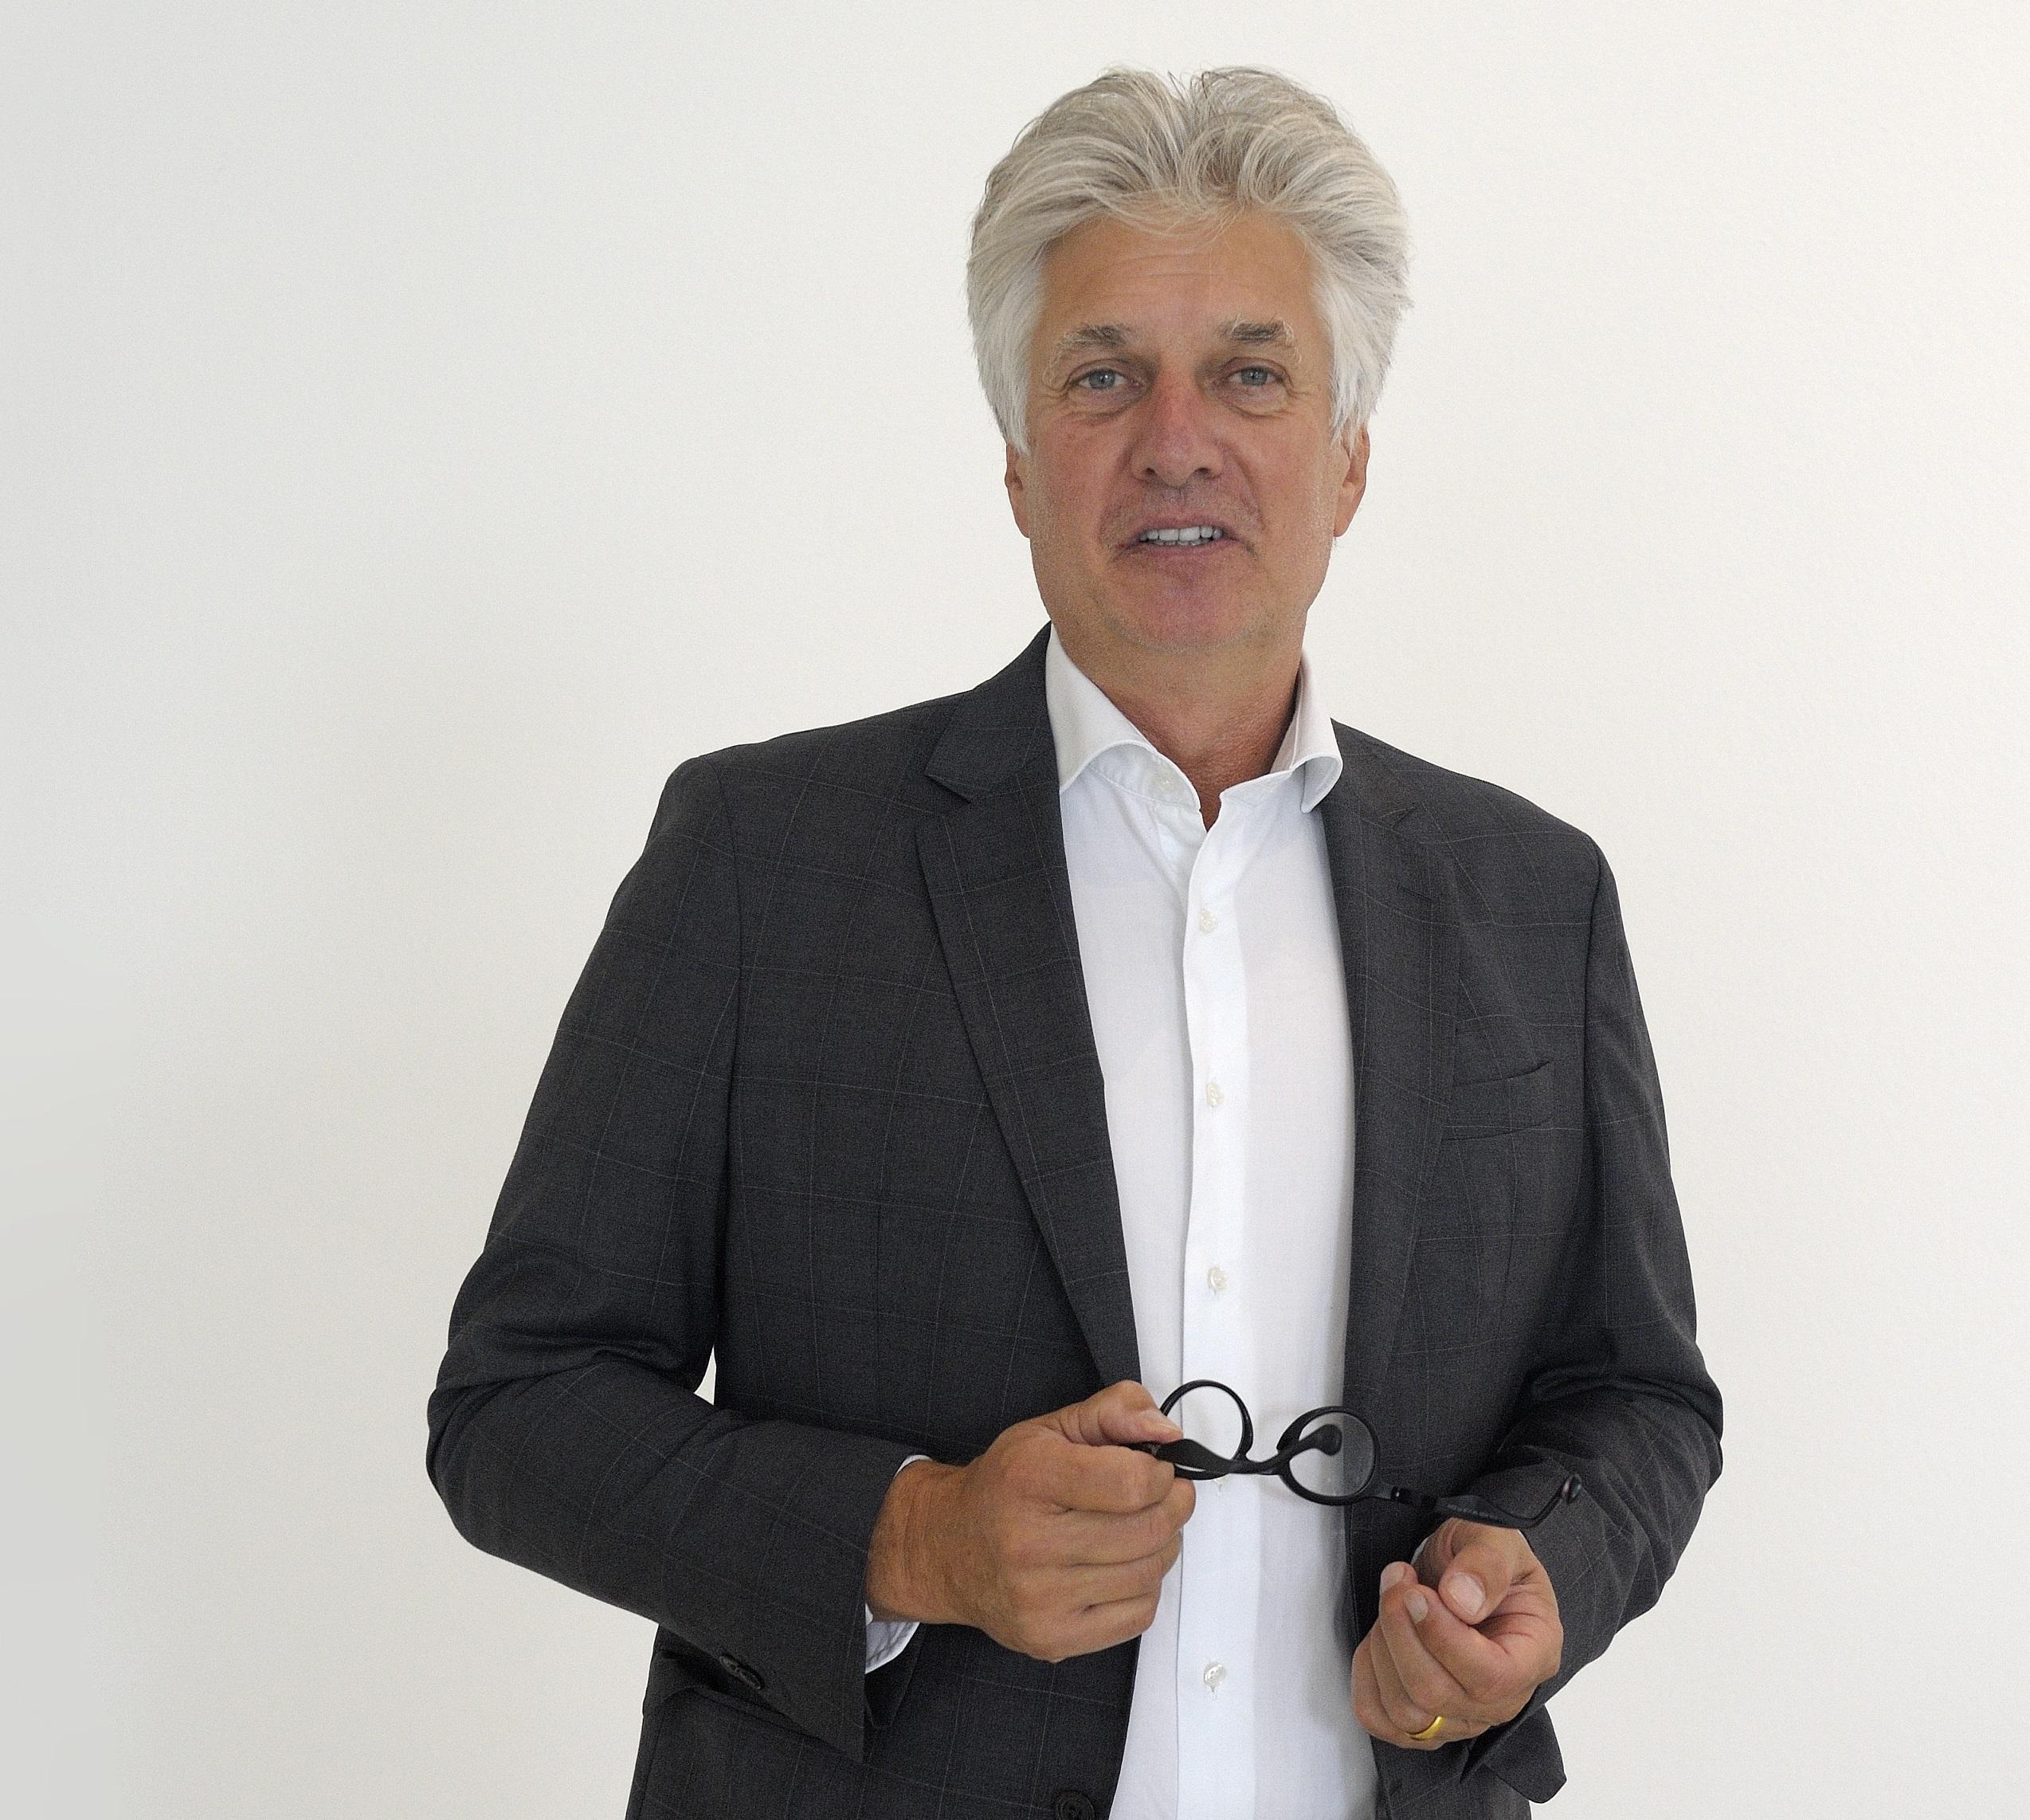 Sven R. Johns